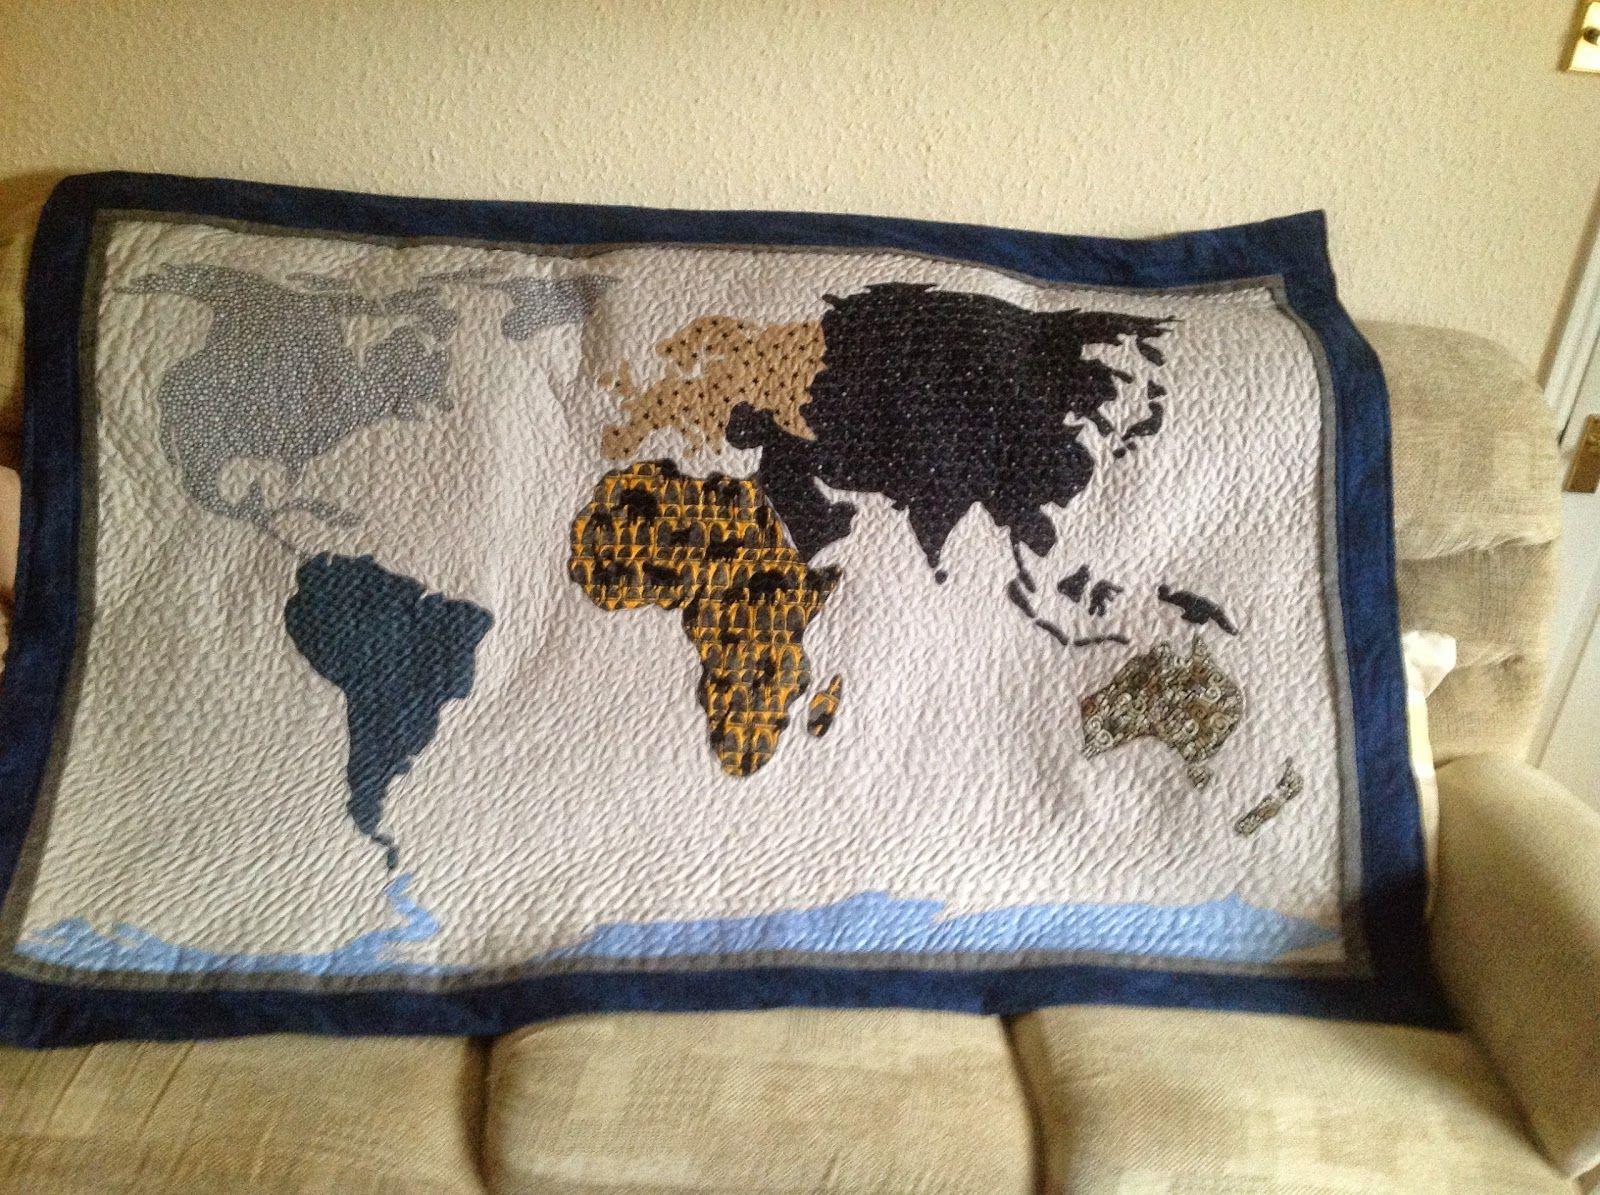 World map quilt quilts maps pinterest mapas world map quilt gumiabroncs Gallery